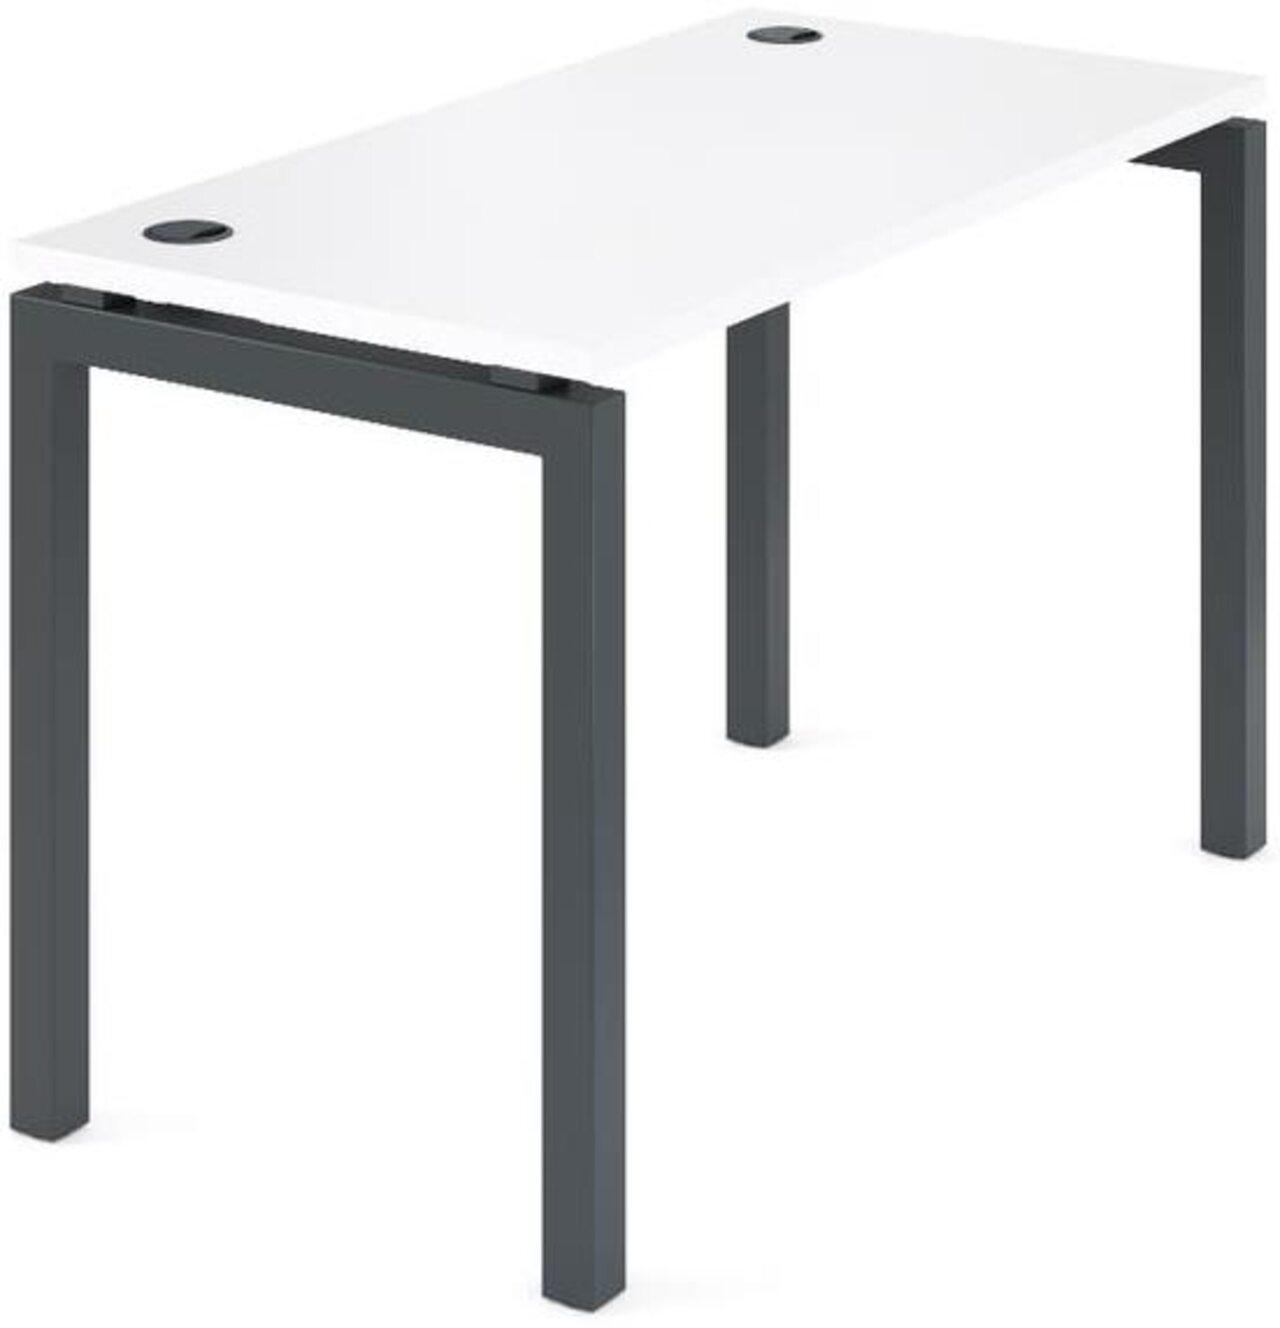 Стол на металлокаркасе  Арго 120x60x76 - фото 1